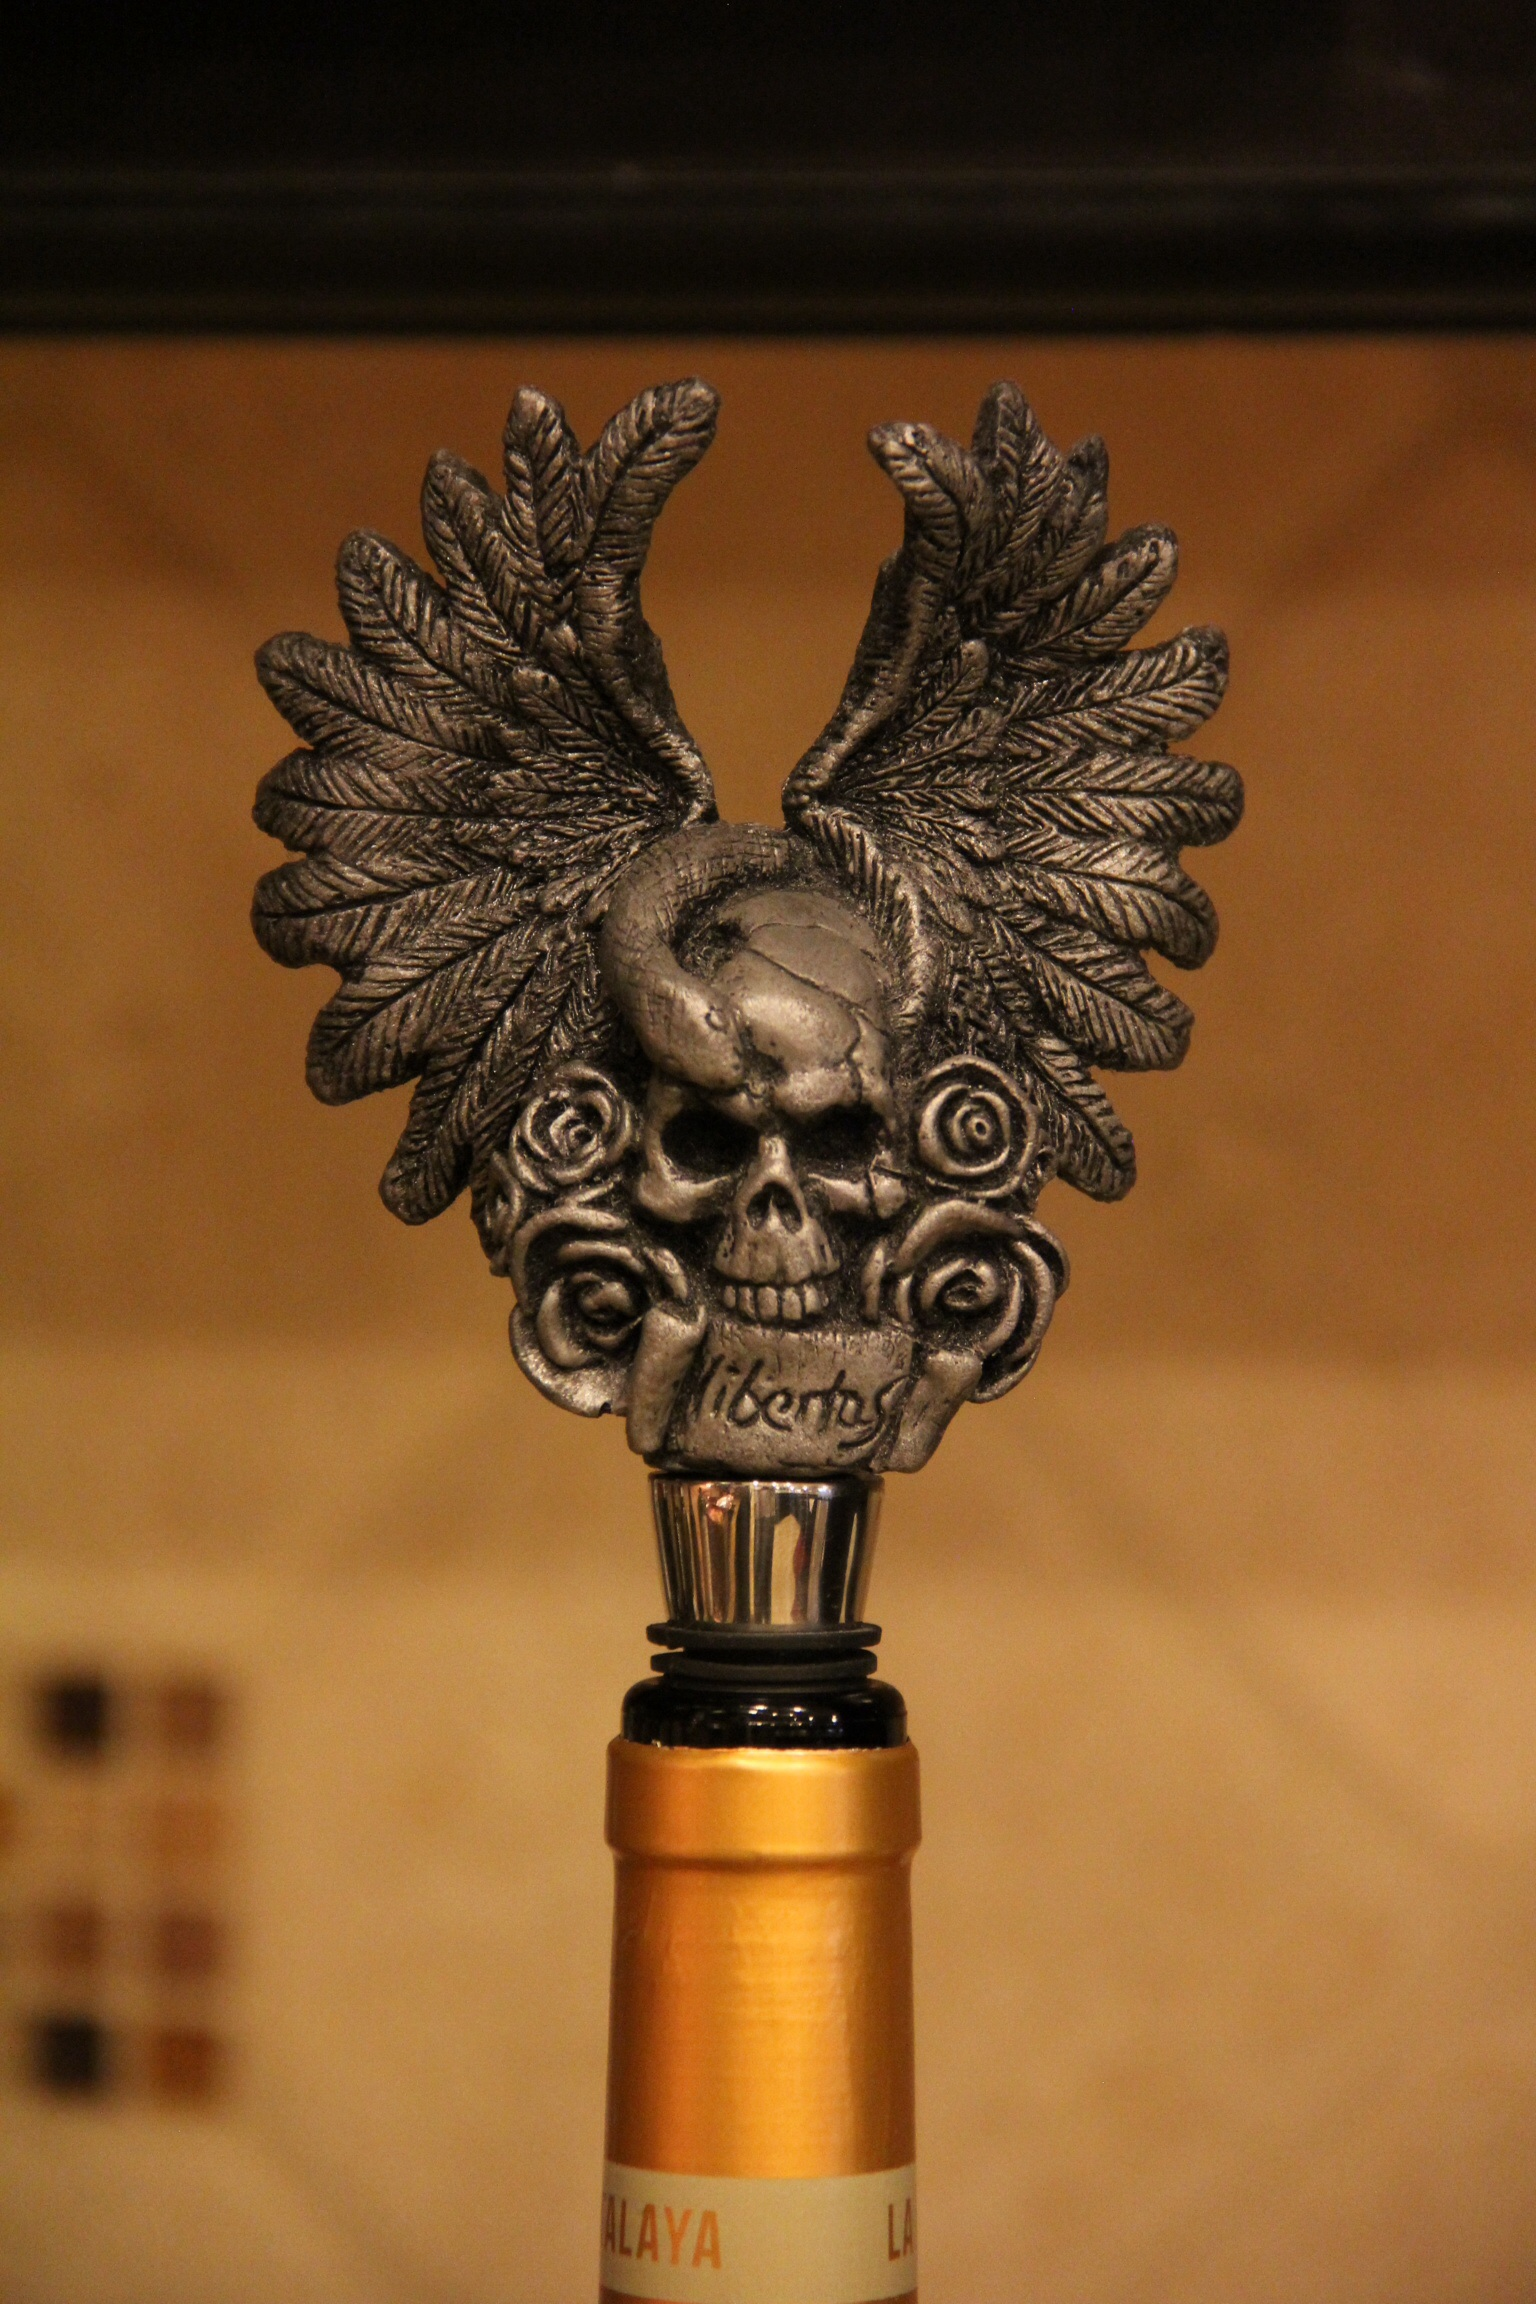 Gerald Gore - Skull wine stopper